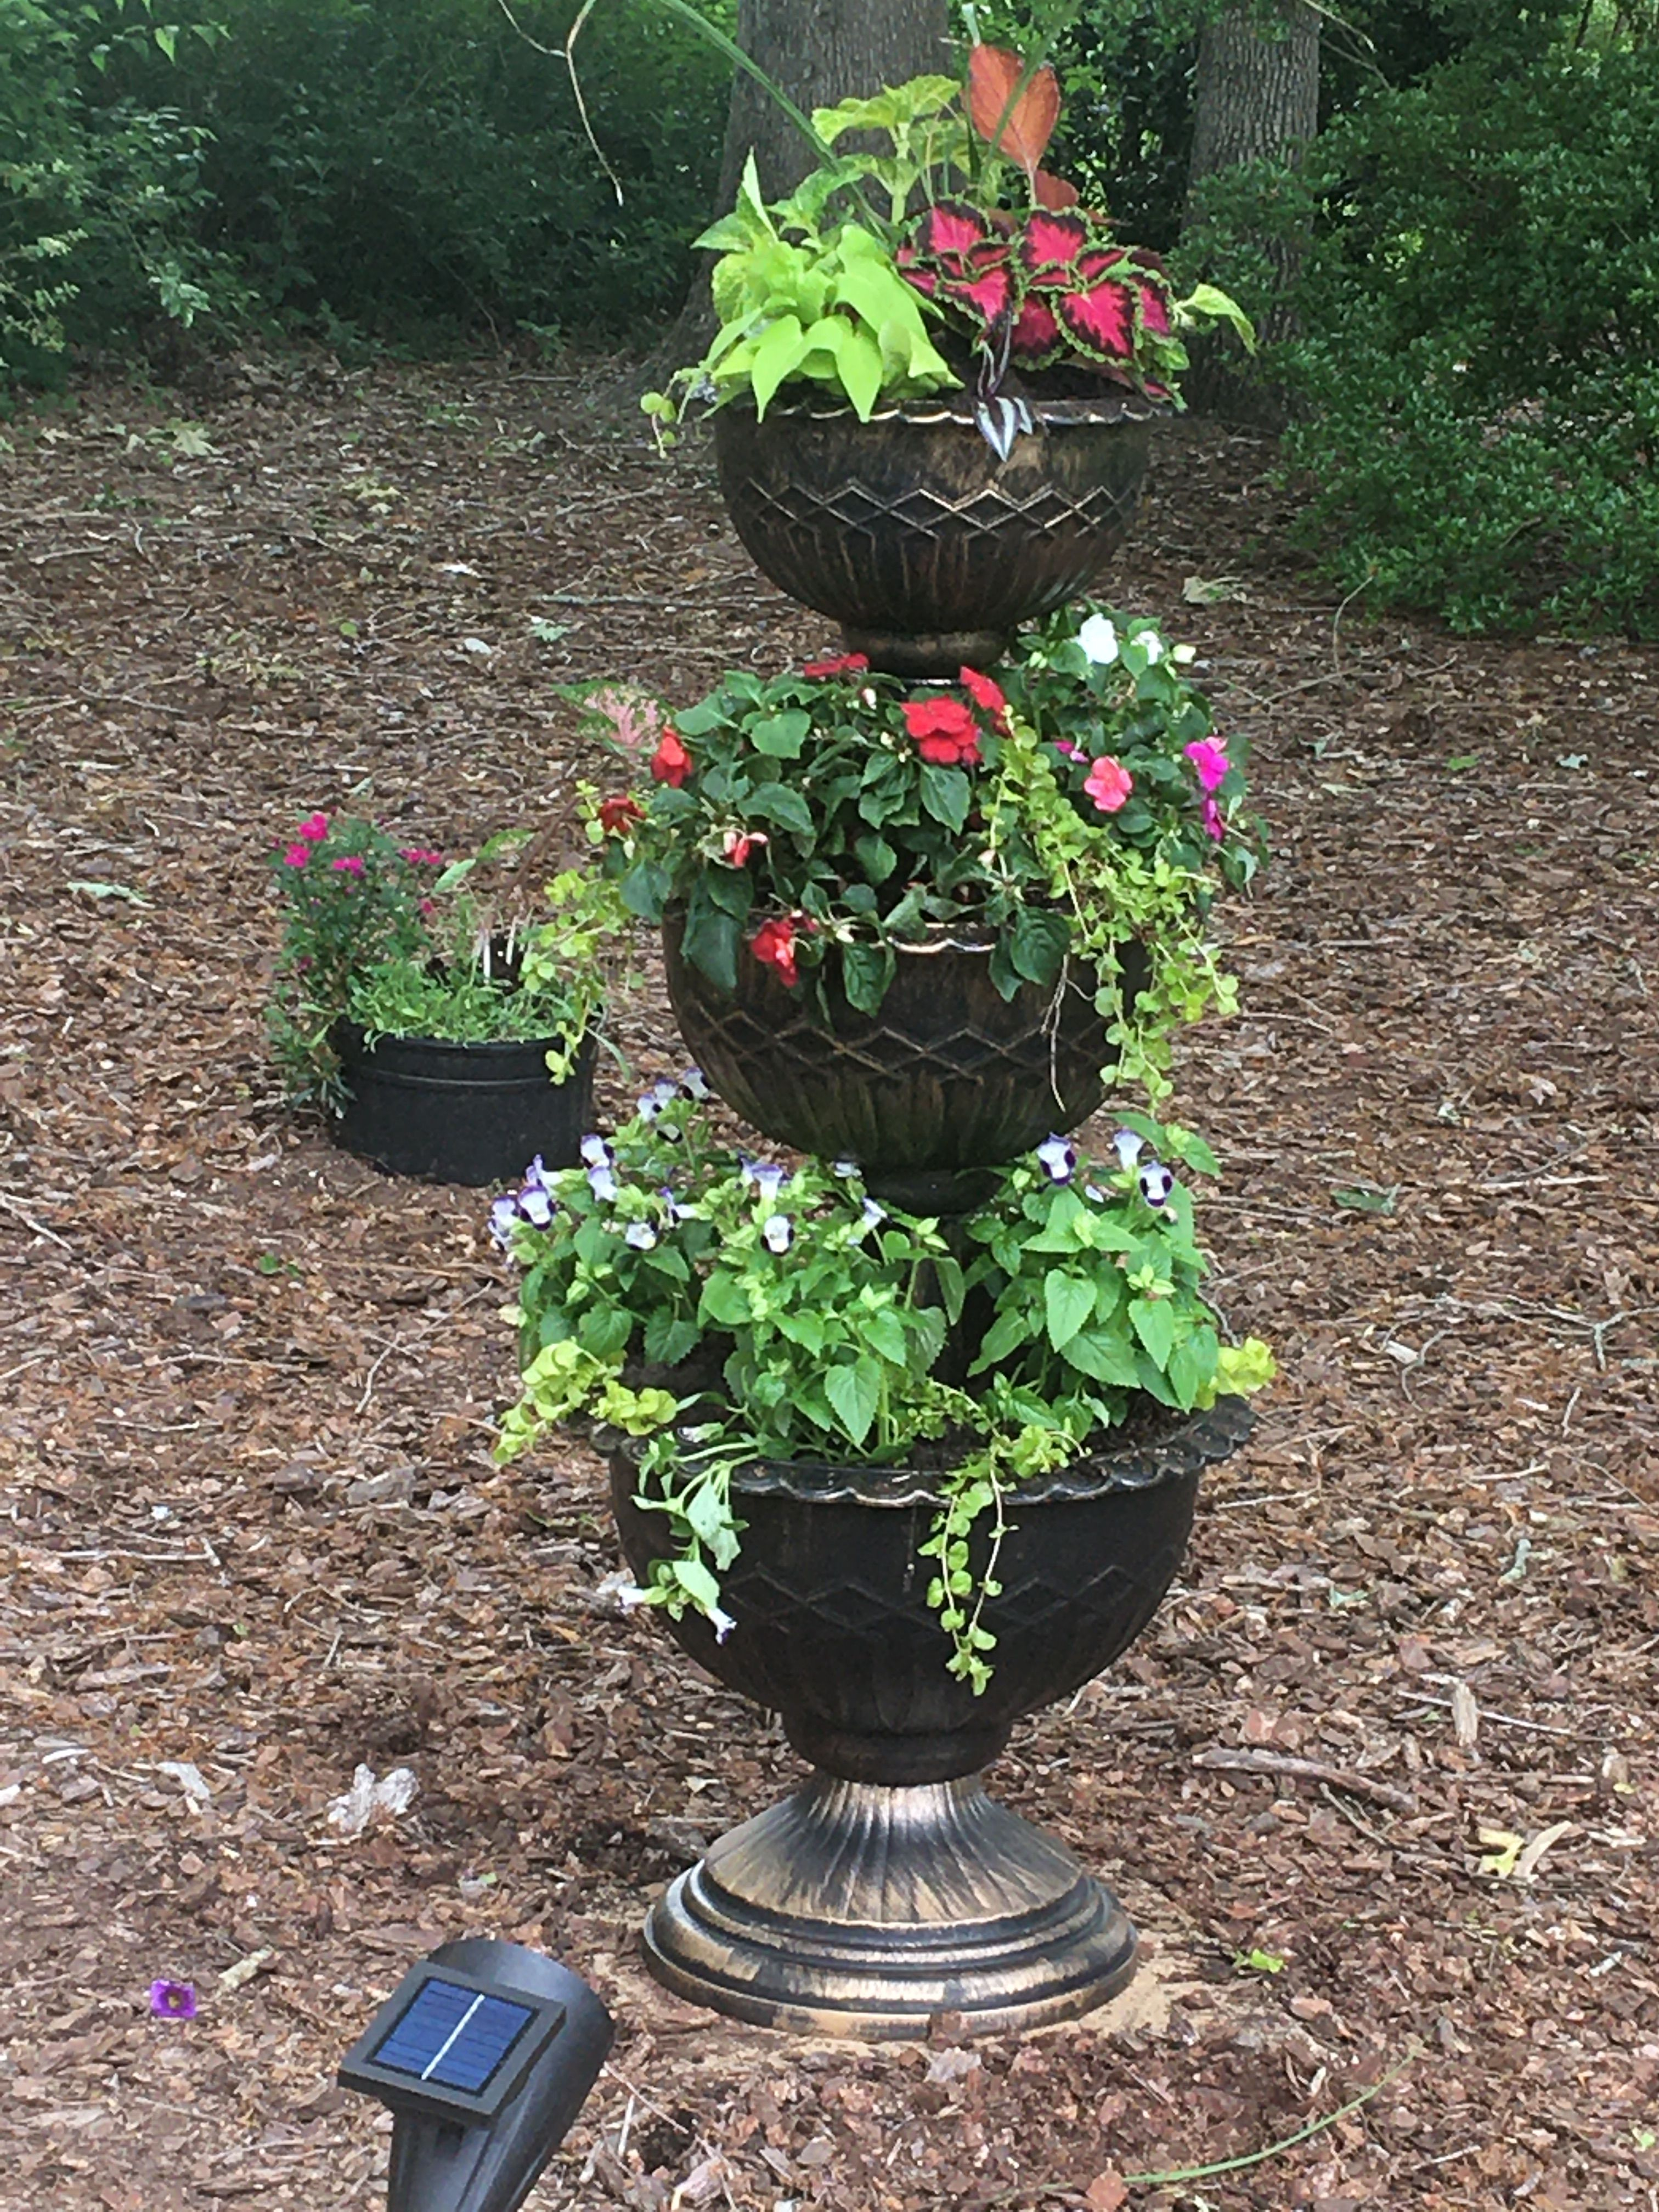 3 Tier Planter Aldi : planter, Stacked, Planter, Flower, Tower,, Beautiful, Gardens,, Tiered